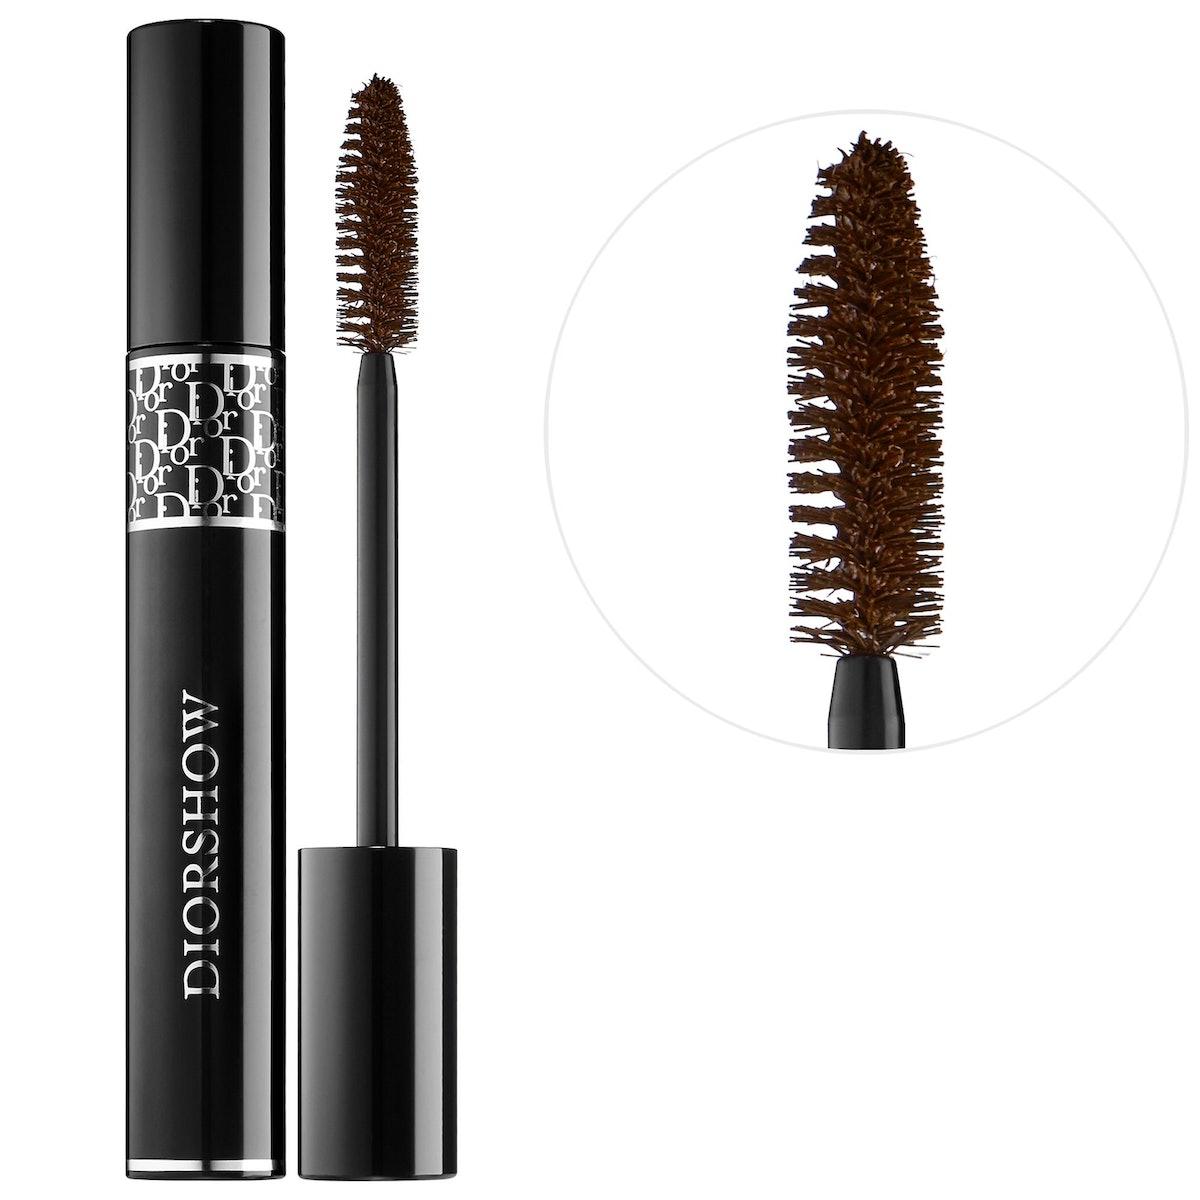 Diorshow Mascara in Brown 698